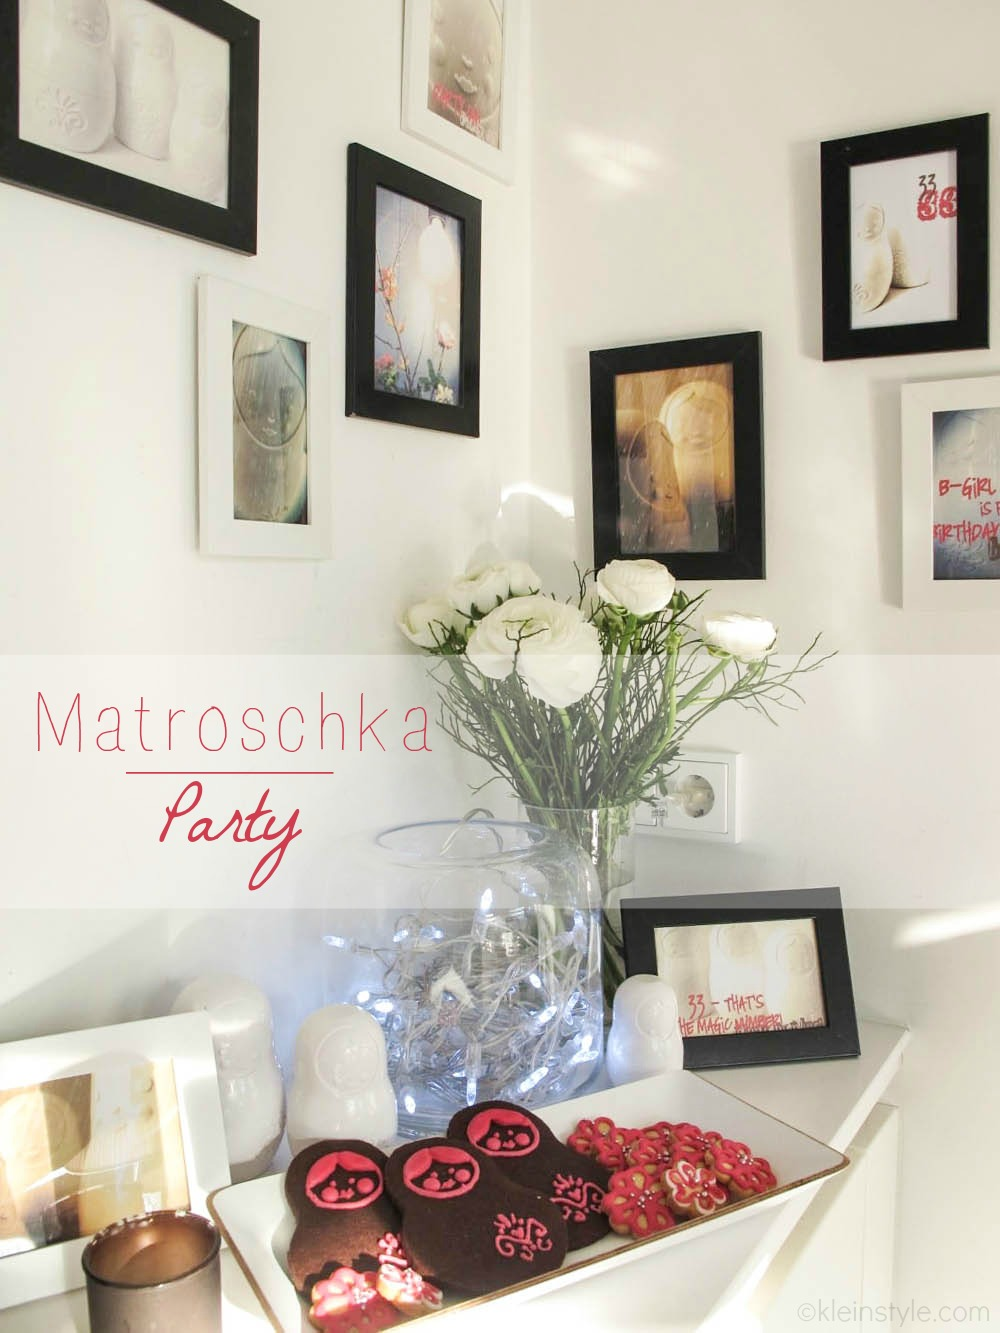 (Kinder)Geburtstag : Matroschka Party!